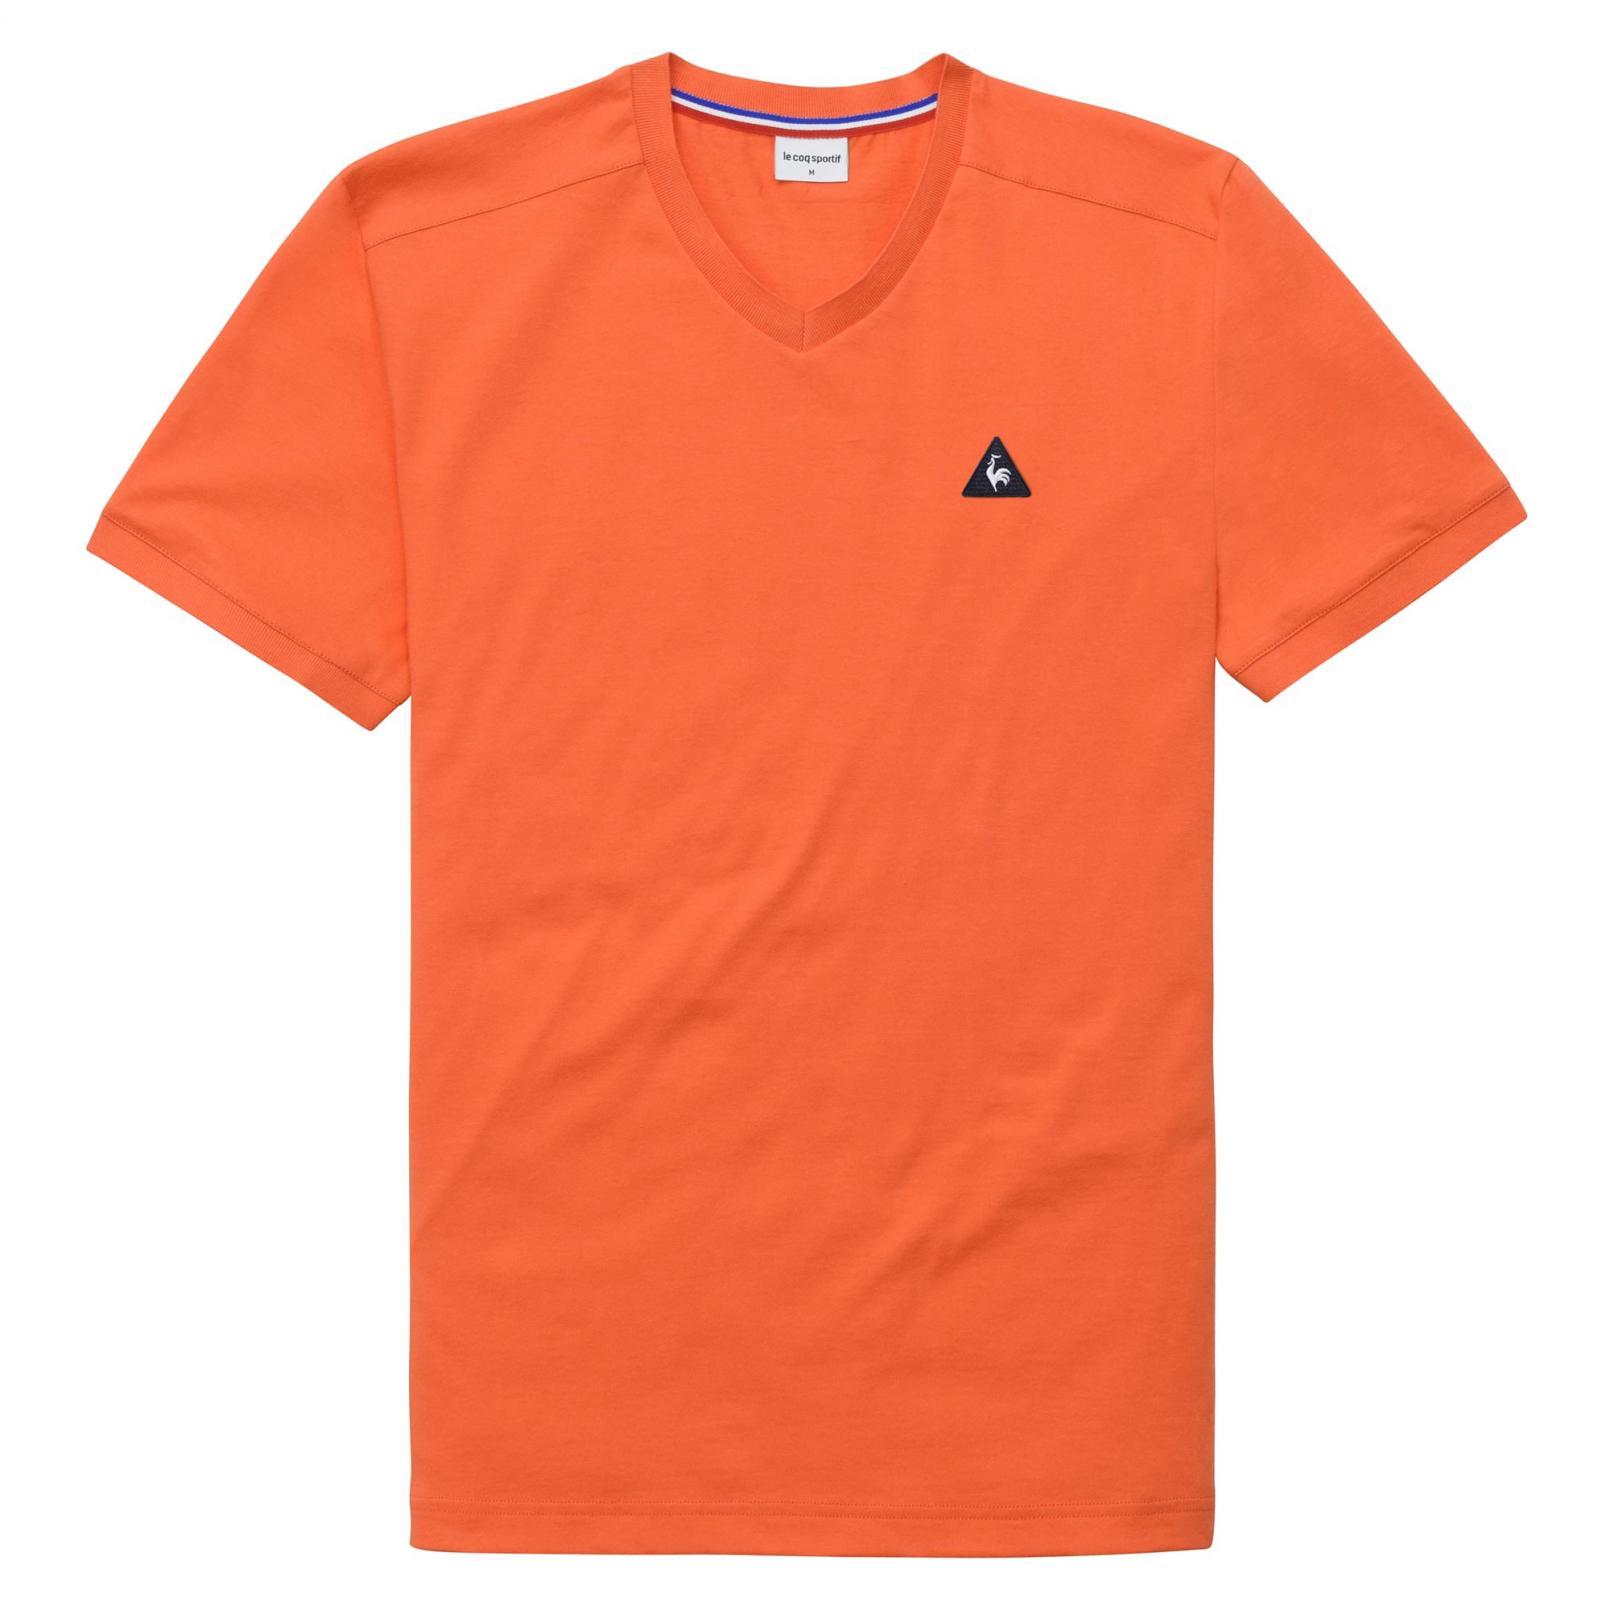 T-shirts – Le Coq Sportif Essentiels T-shirt Orange